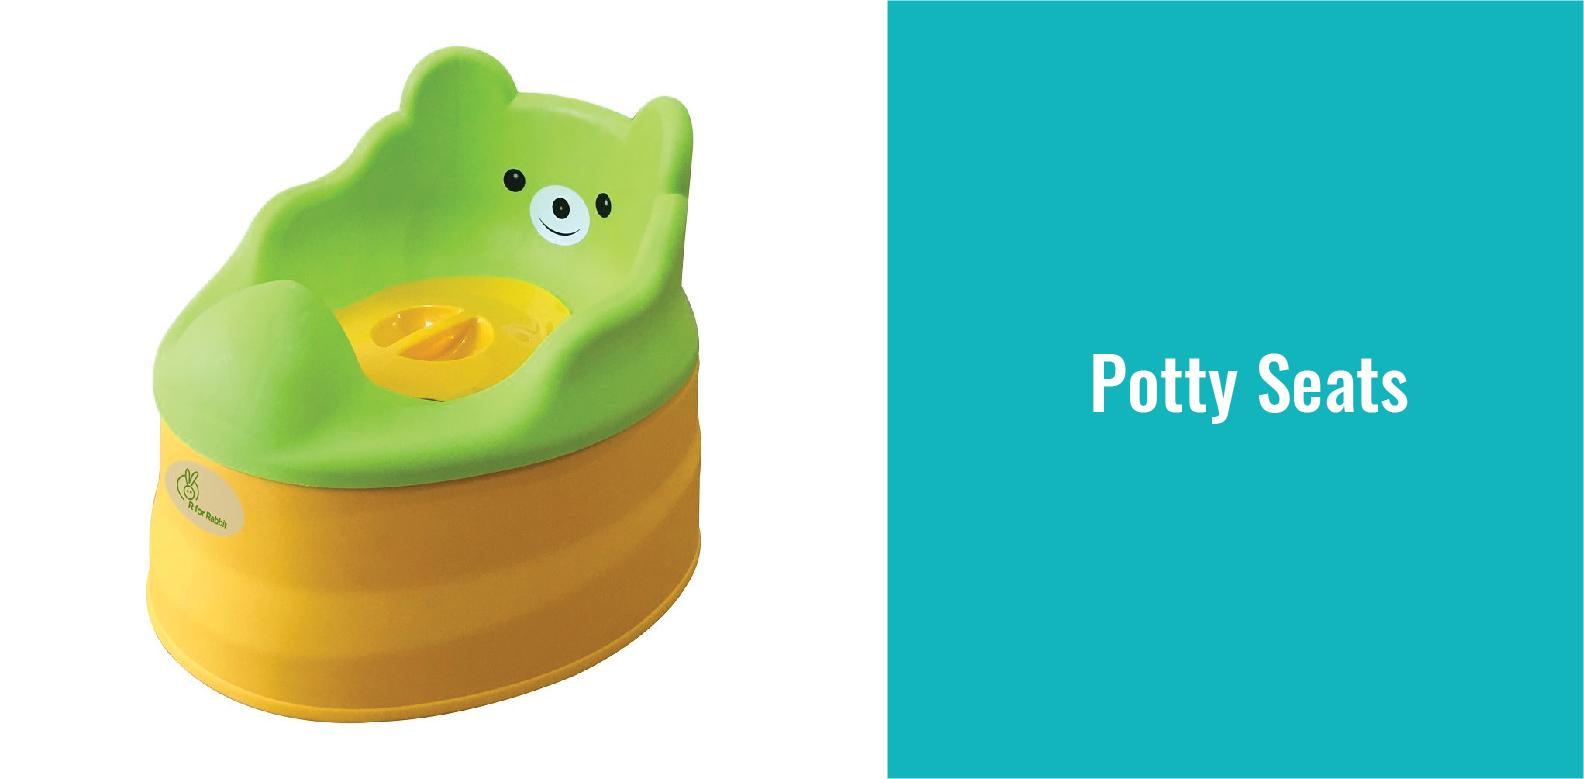 Baby Potty Seats & Bathroom Accessories